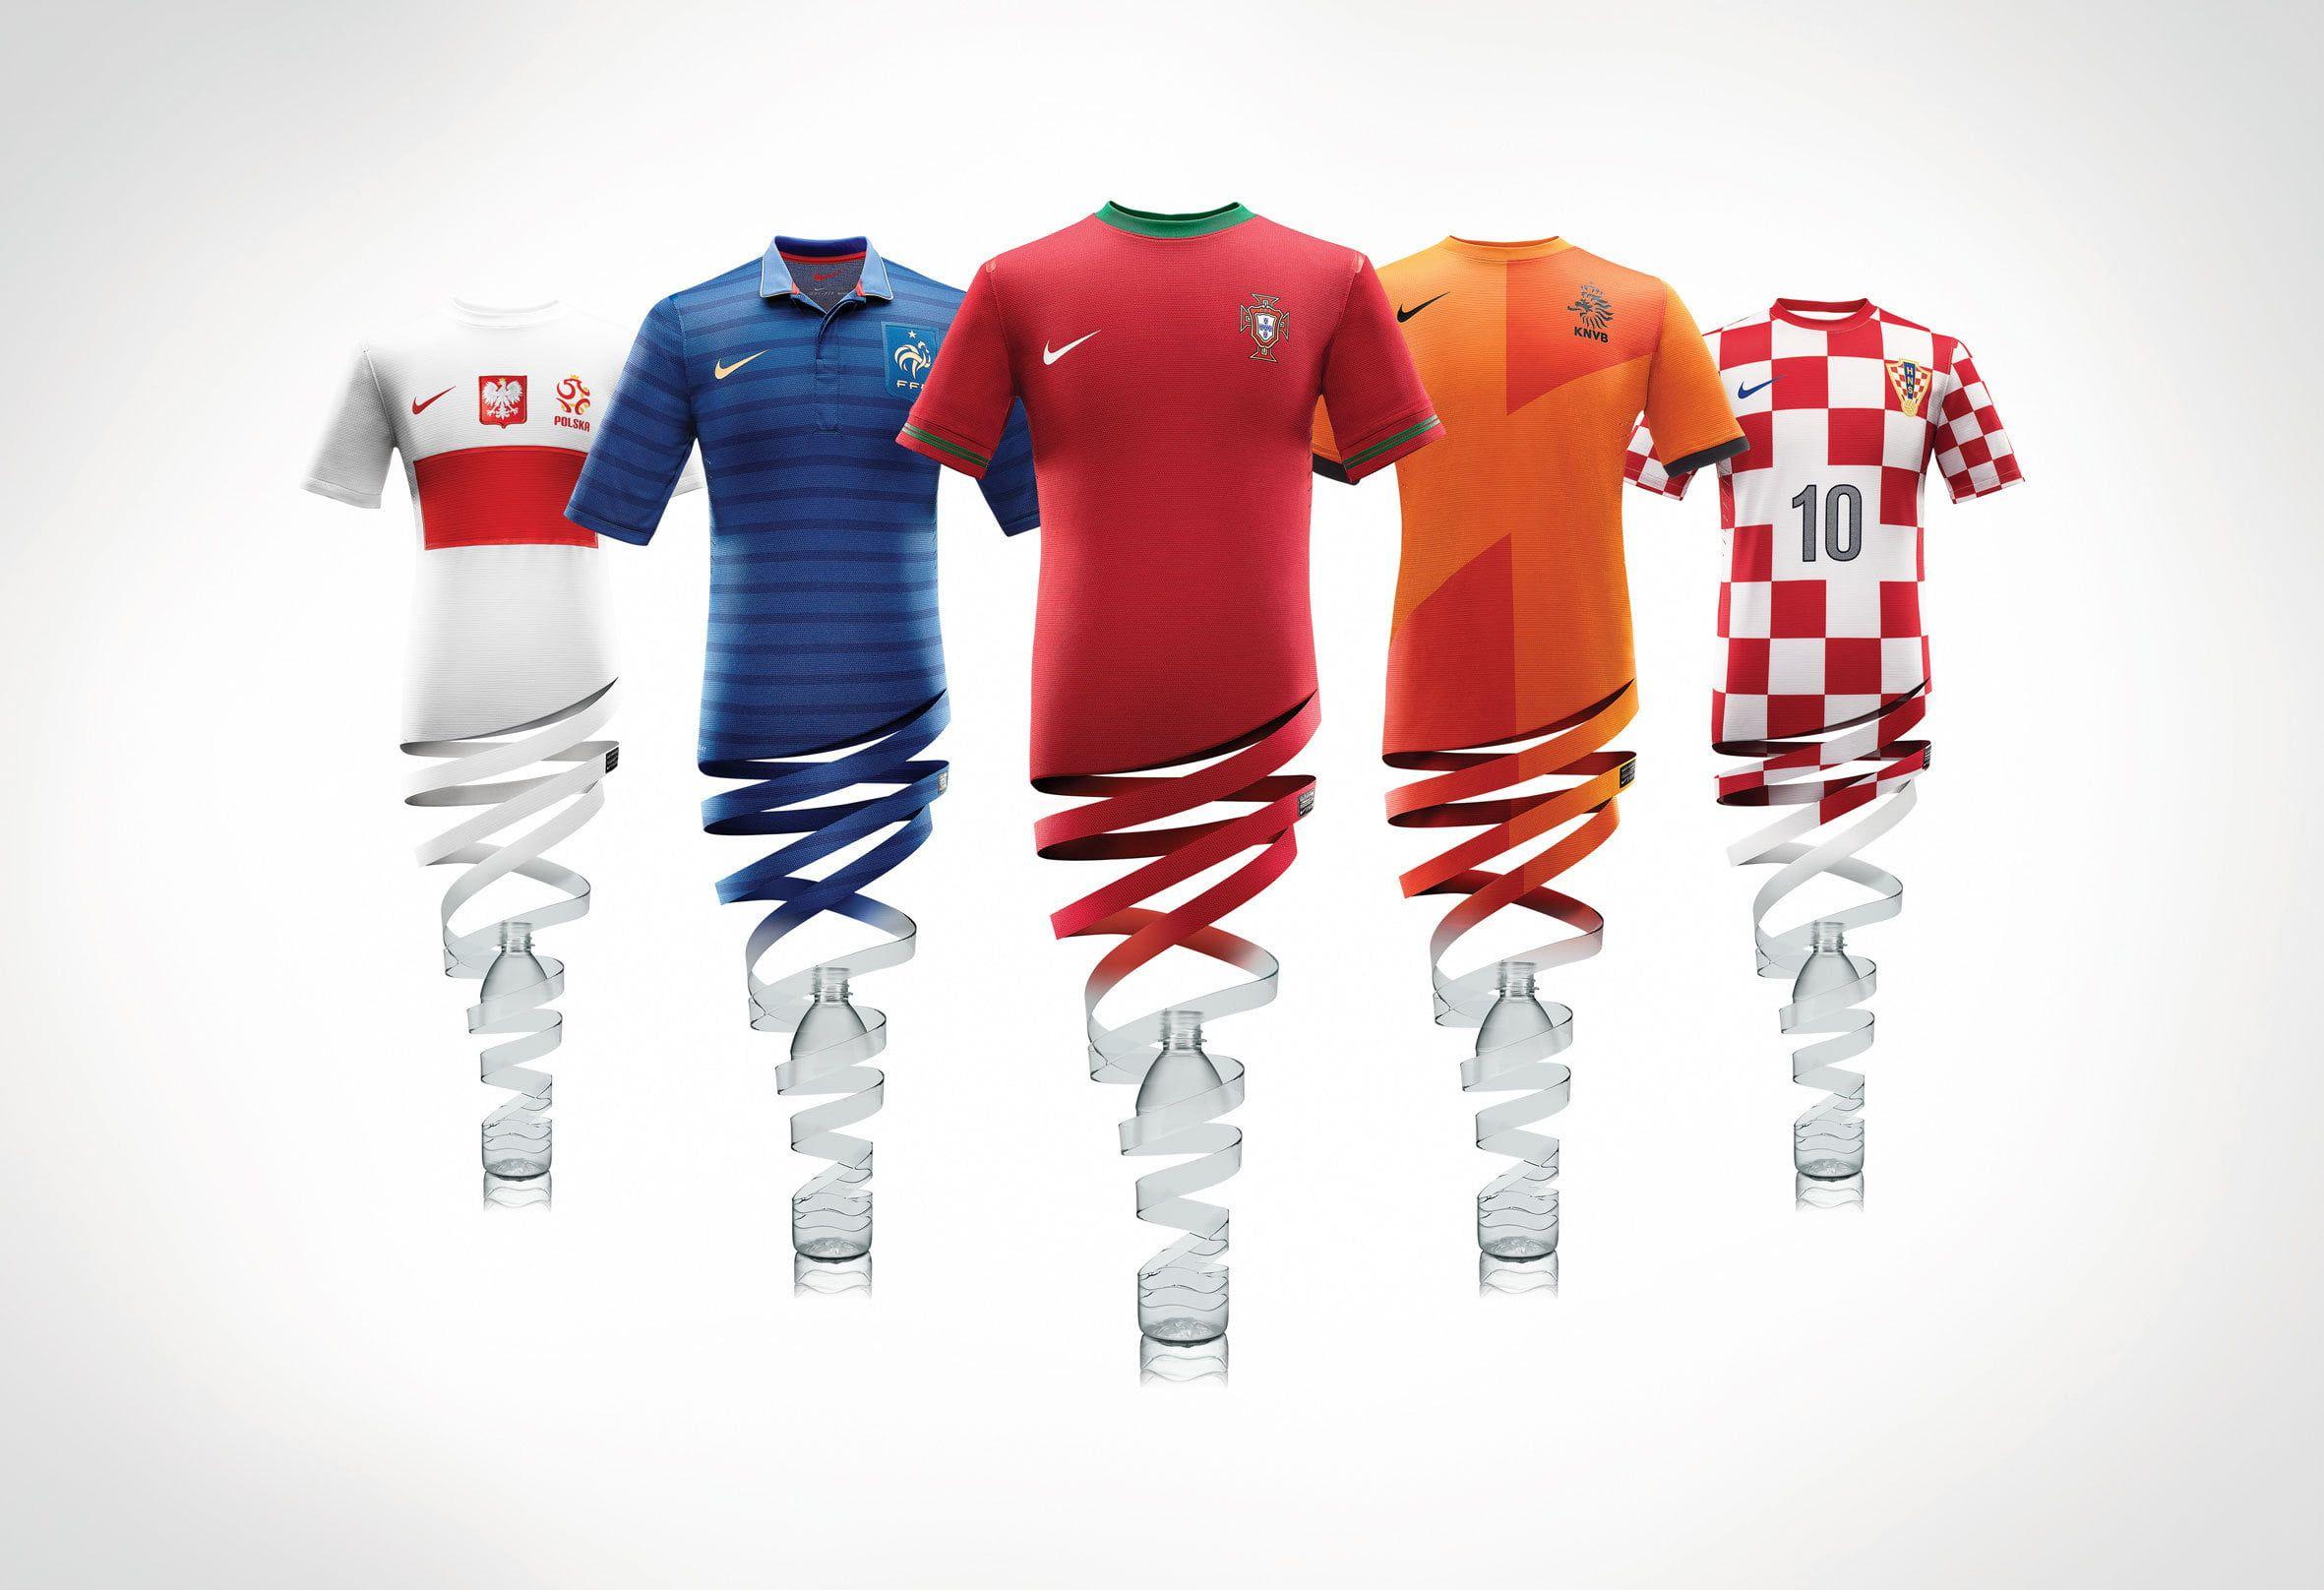 Five White Blue Red And Orange Nike Jersey Shirts Football Ronaldo Football Ronaldo Soccer Modric In 2020 White Jersey Shirt Red And White Adidas Jersey Shirt